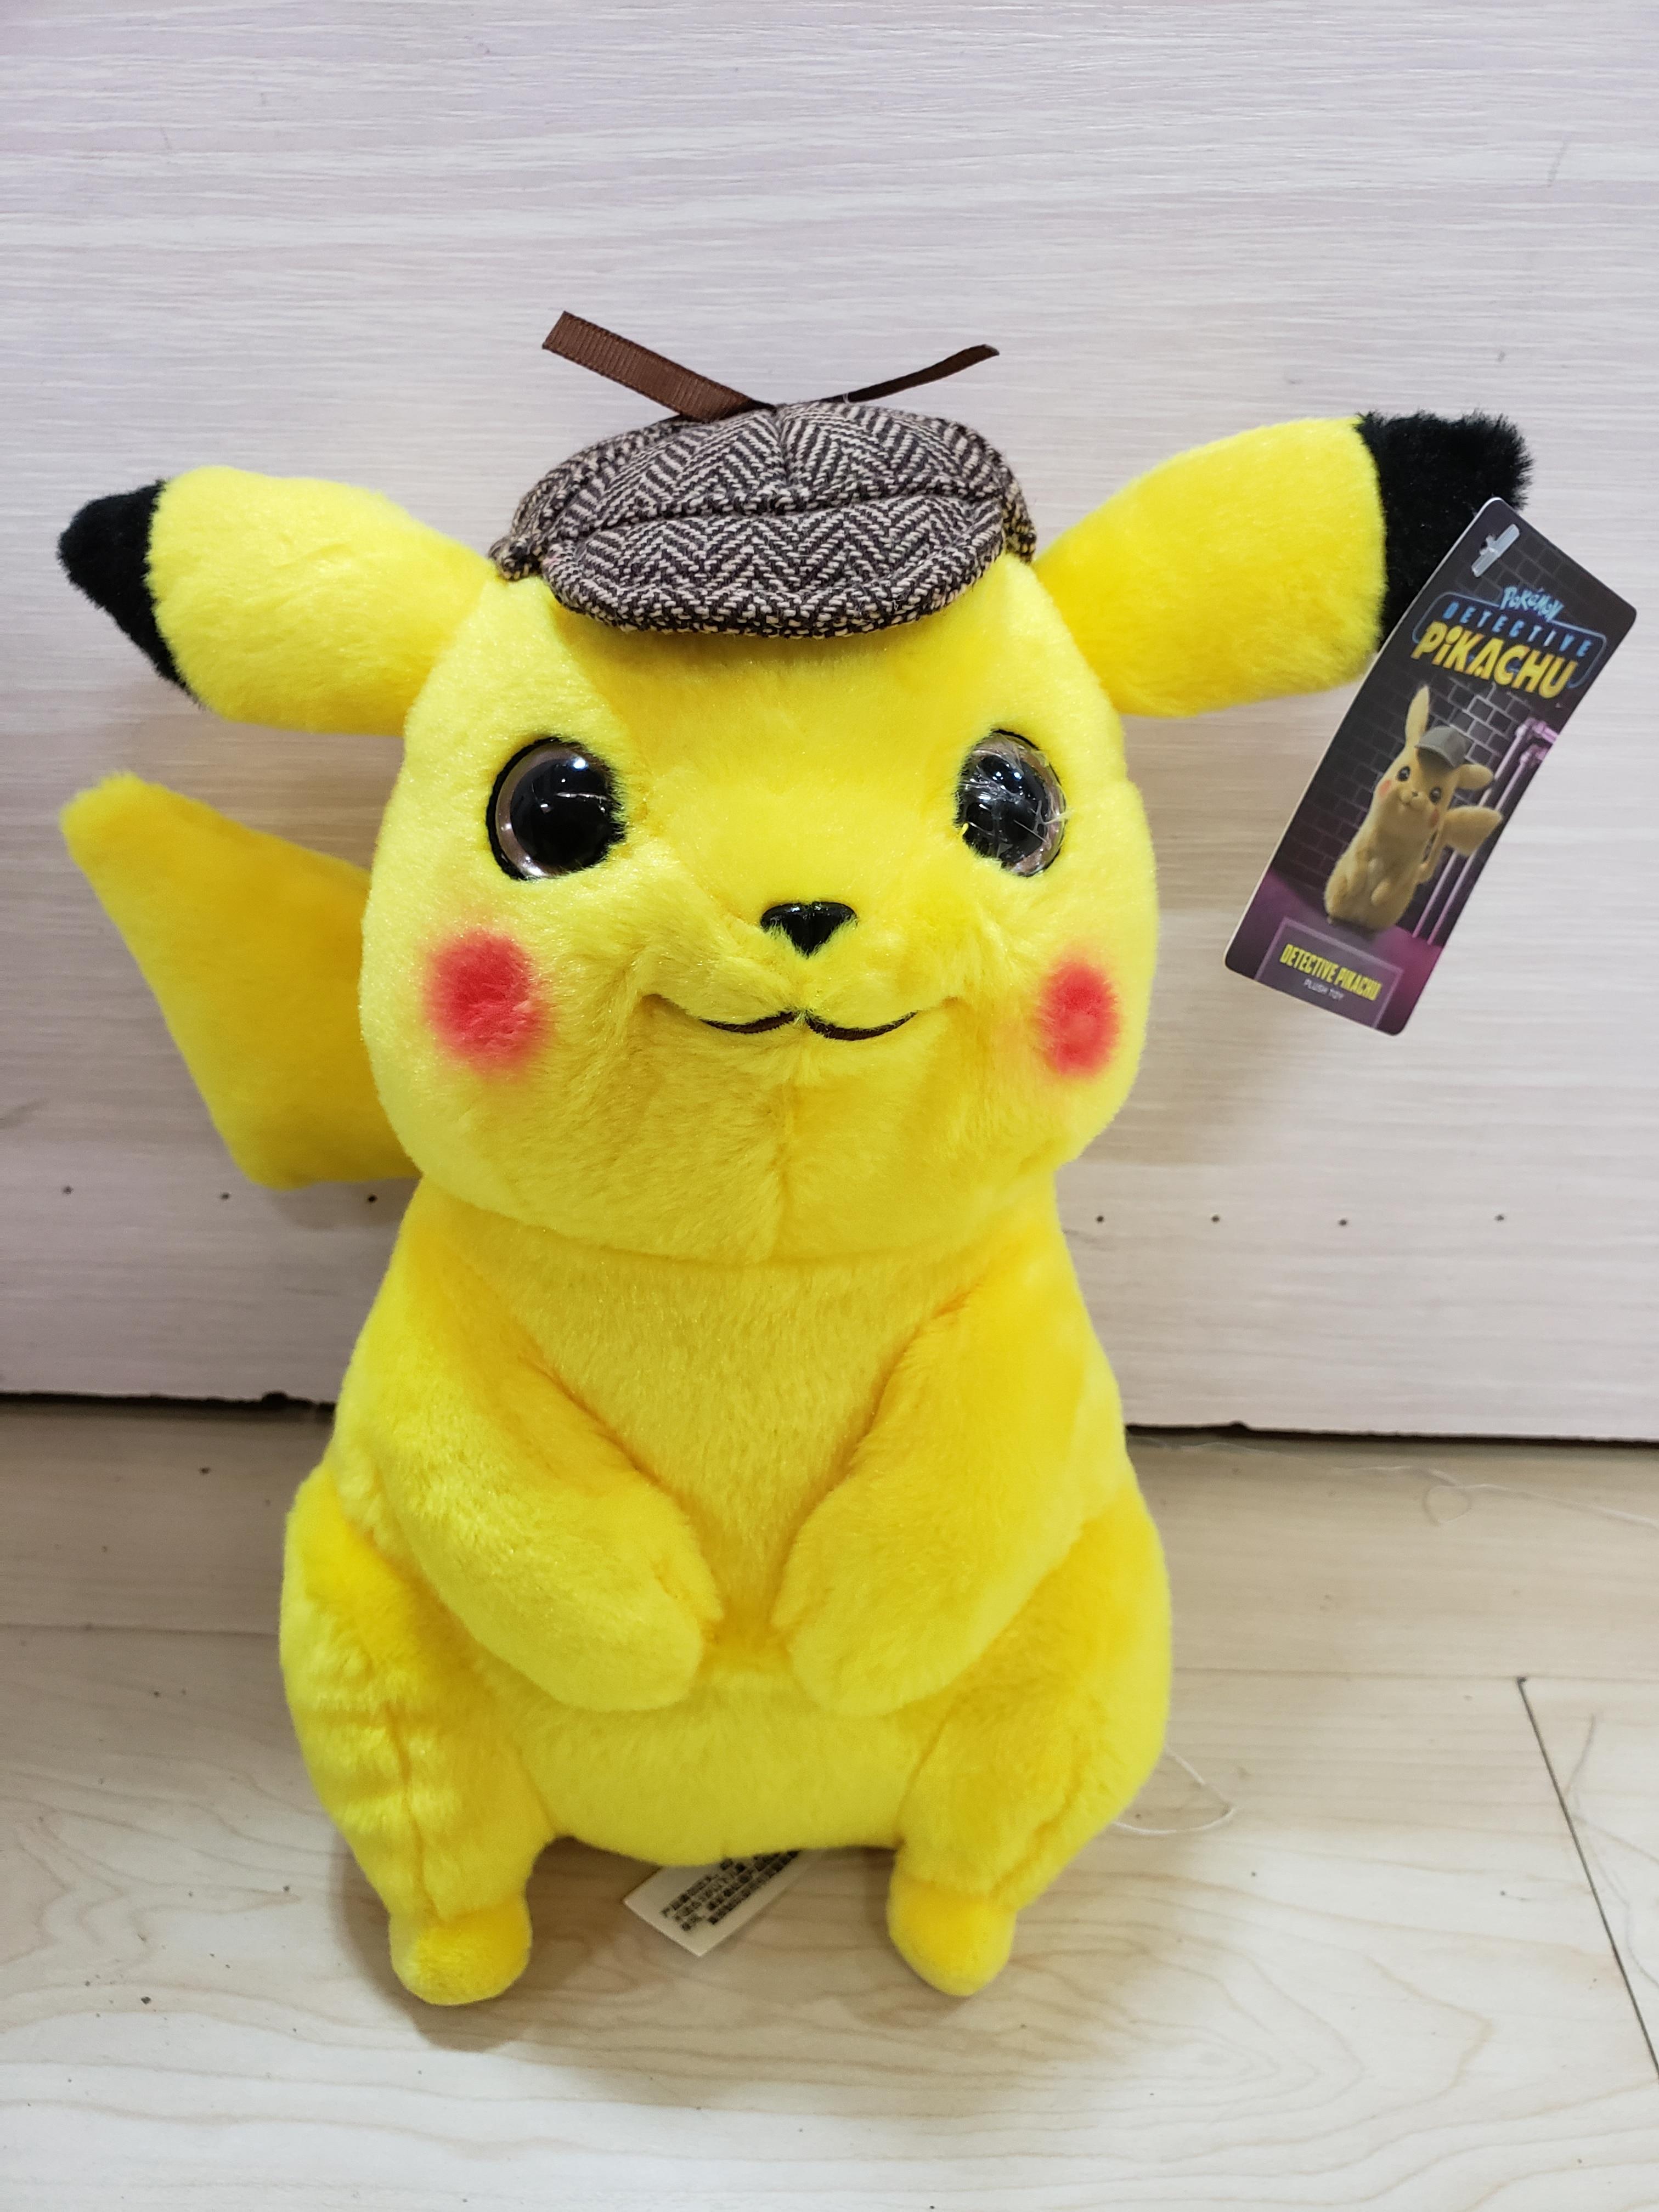 2019 New 25/35/40cm Detective Pikachu Plush Toy High Quality Cute Anime Plush Toys Children's Gift Toy Kids Cartoon Peluche